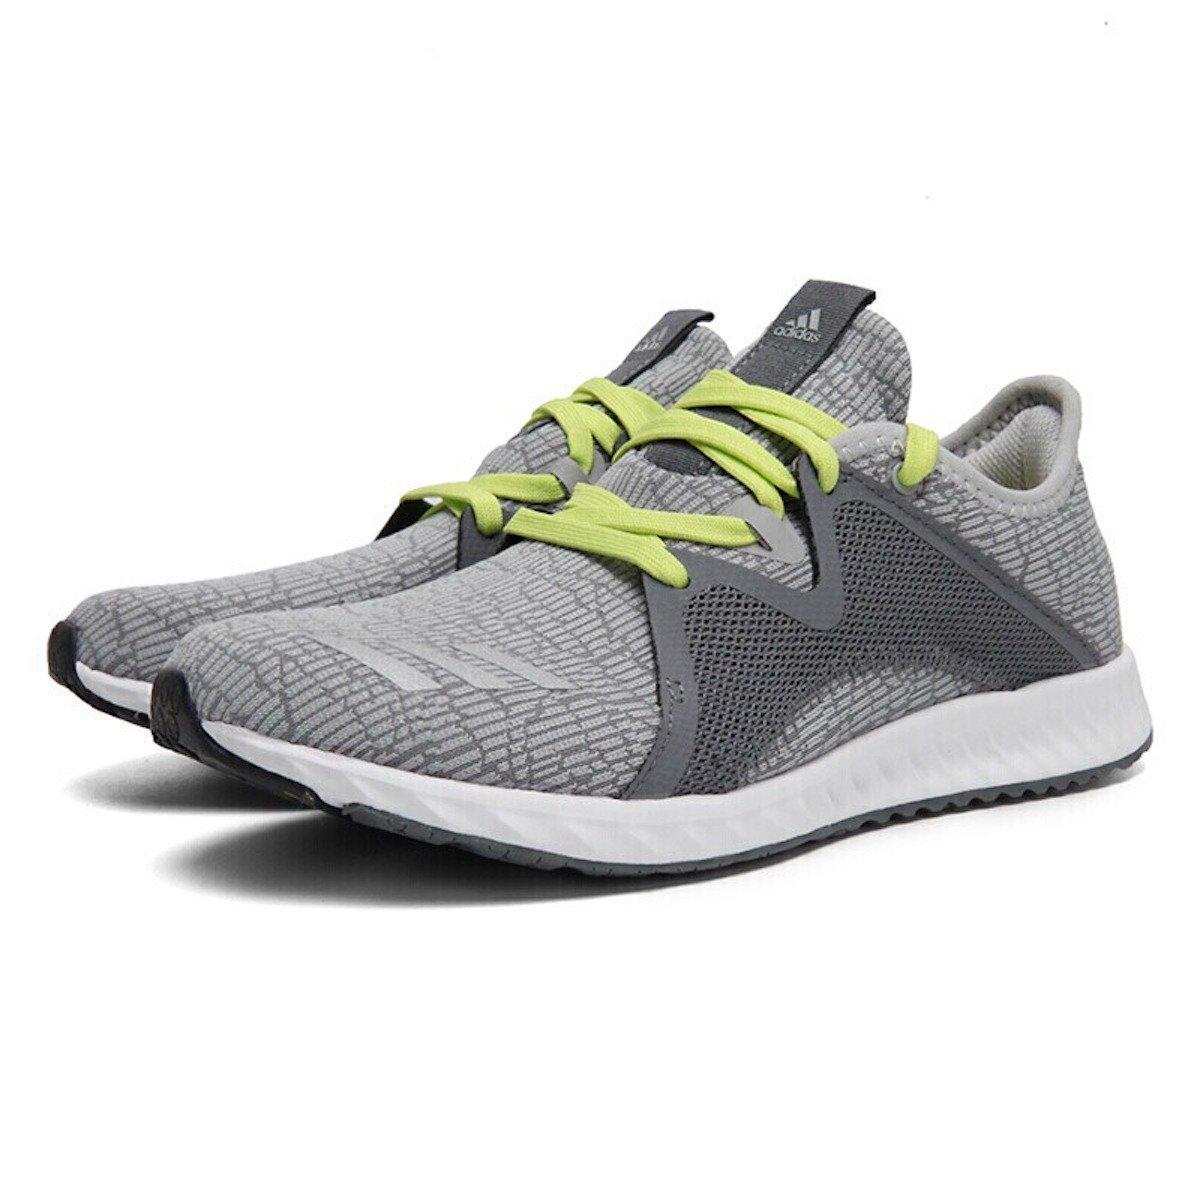 adidas Women's Edge Lux 2 W B07DD28SGT 8 B(M) US|Grey/Lime Green